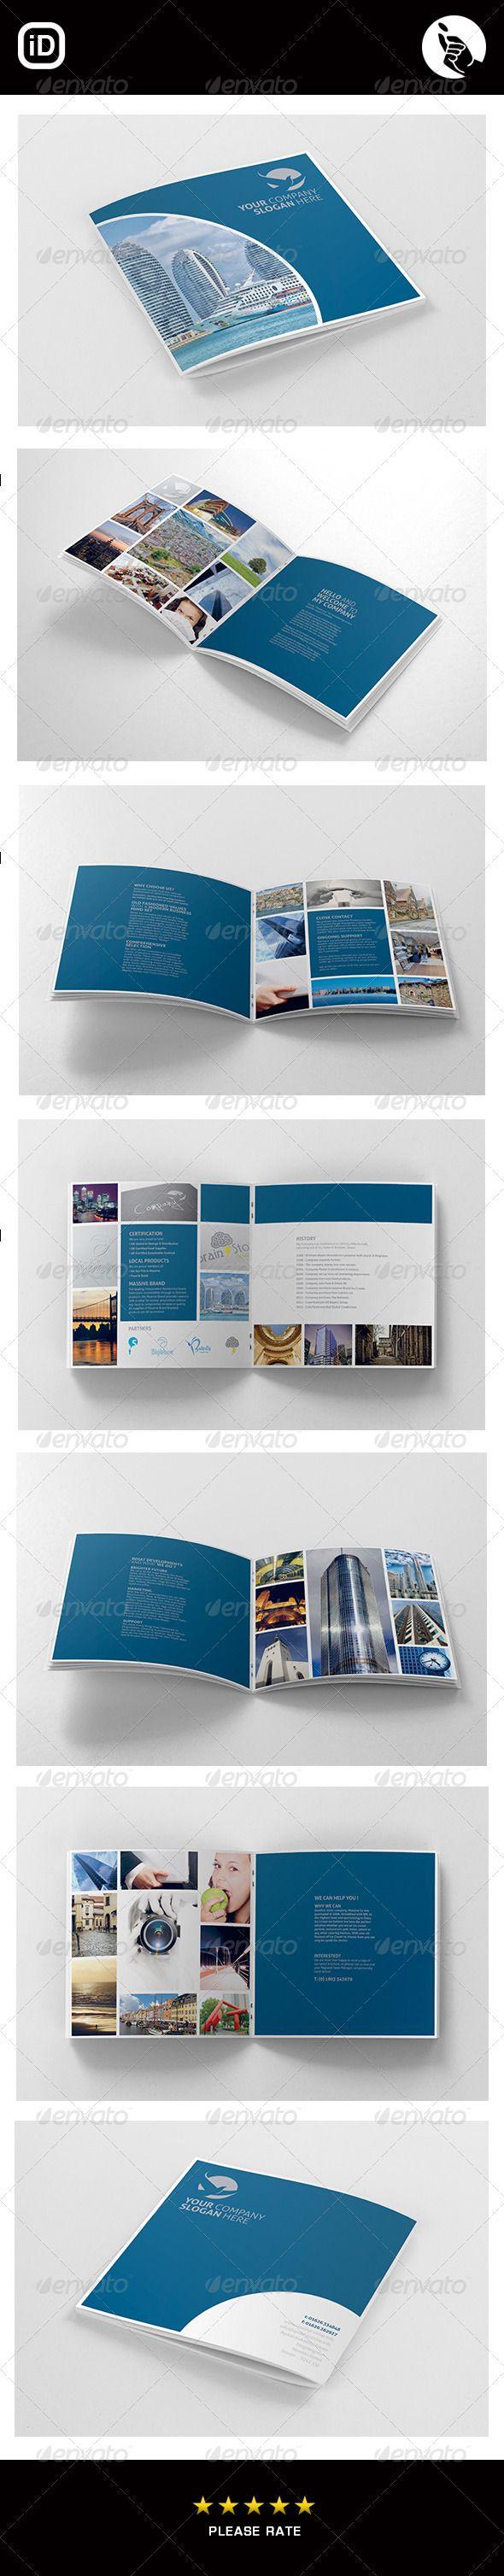 Corporate Square 12 Page Brochure